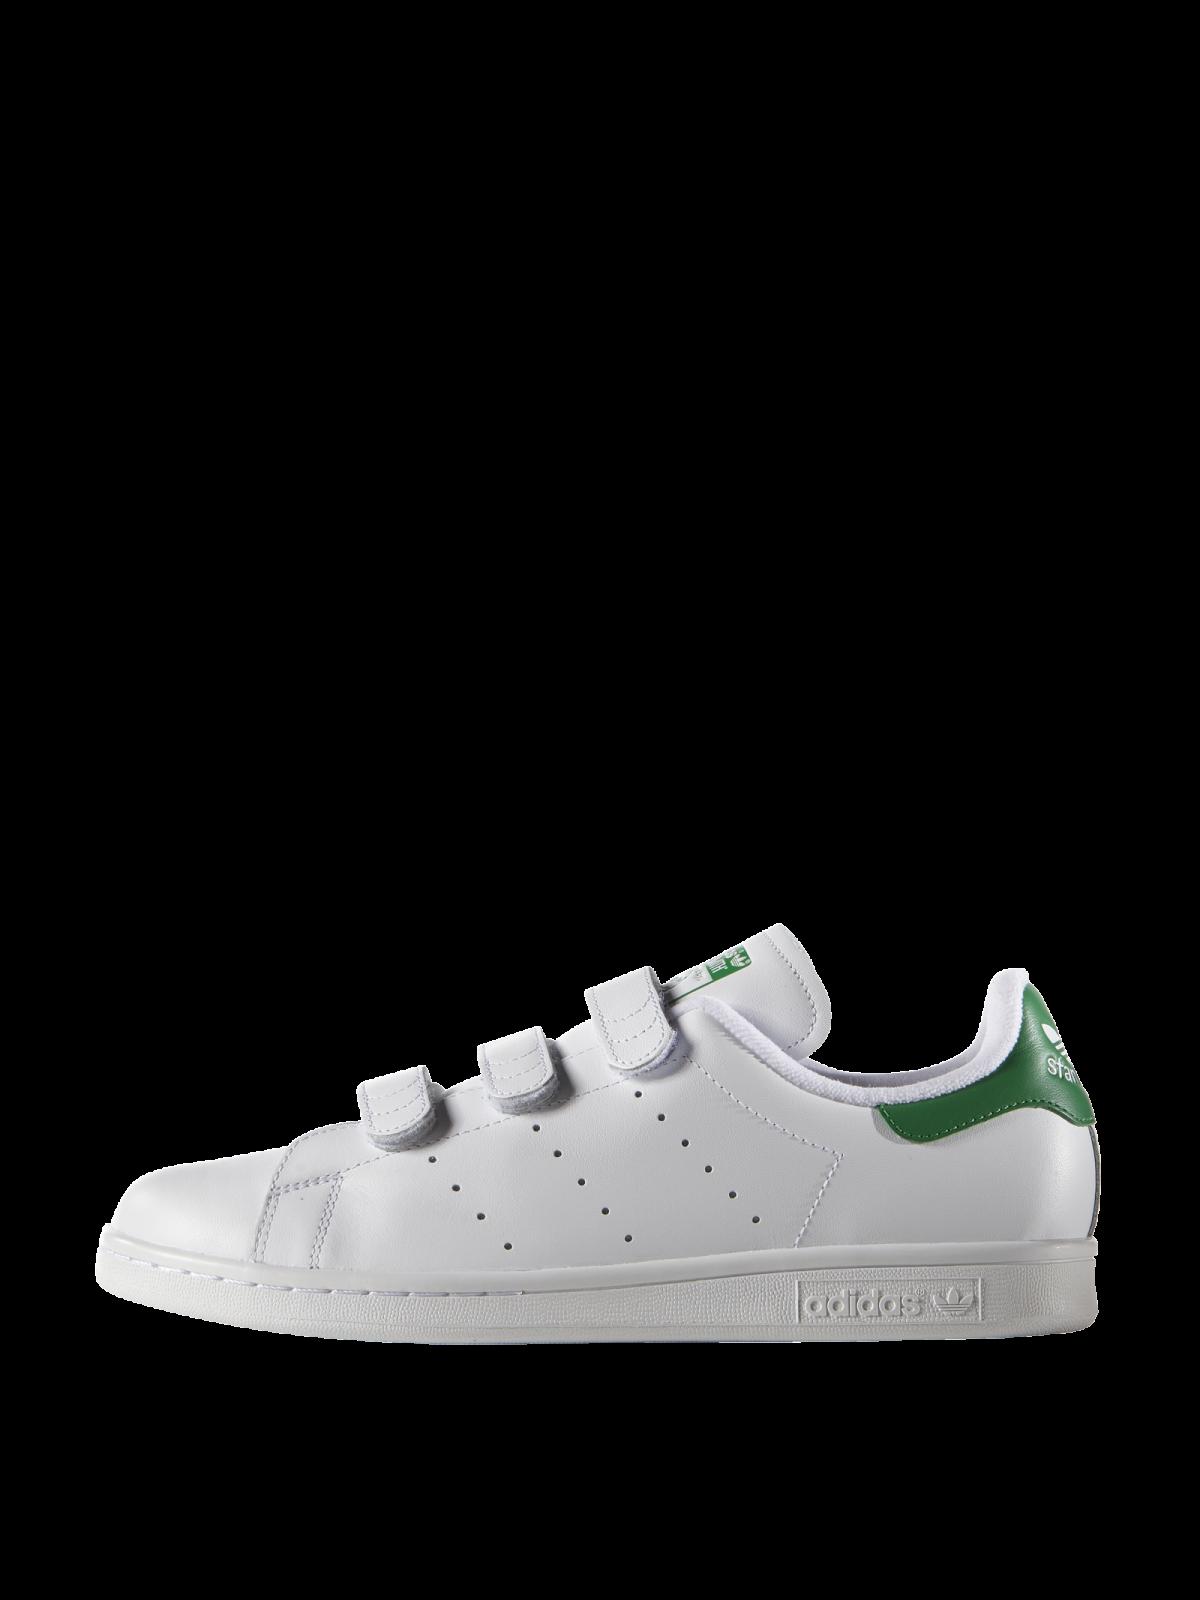 online retailer 0085b 52ac6 Adidas Stan Smith Junior Blanc Vert Cuir Velcro TFlc31JK